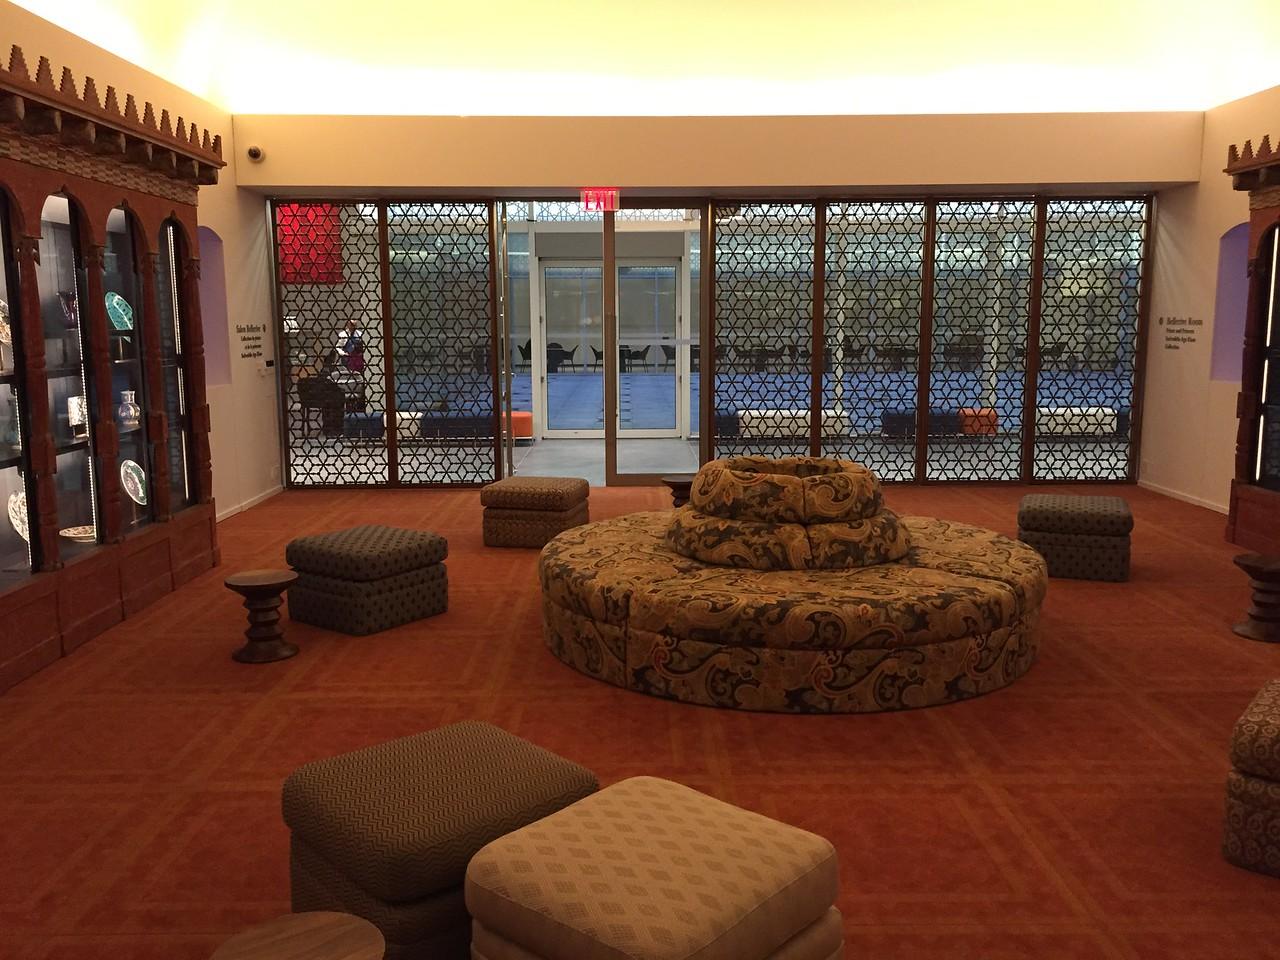 Bellerive Room, Aga Khan Museum. Toronto, Canada.